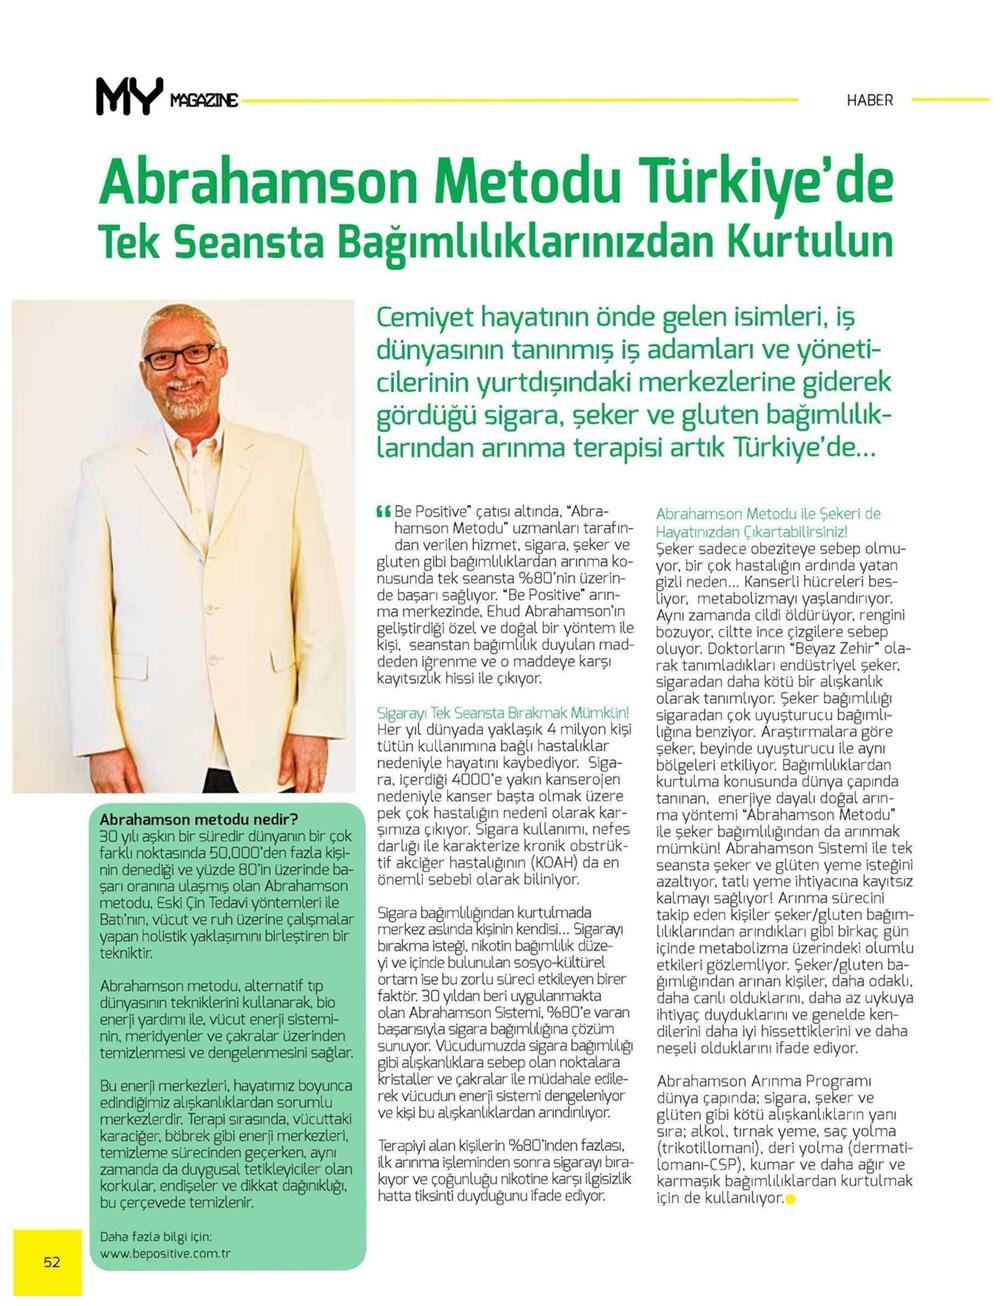 my_magazine_01.09.2015_51317700_(1)